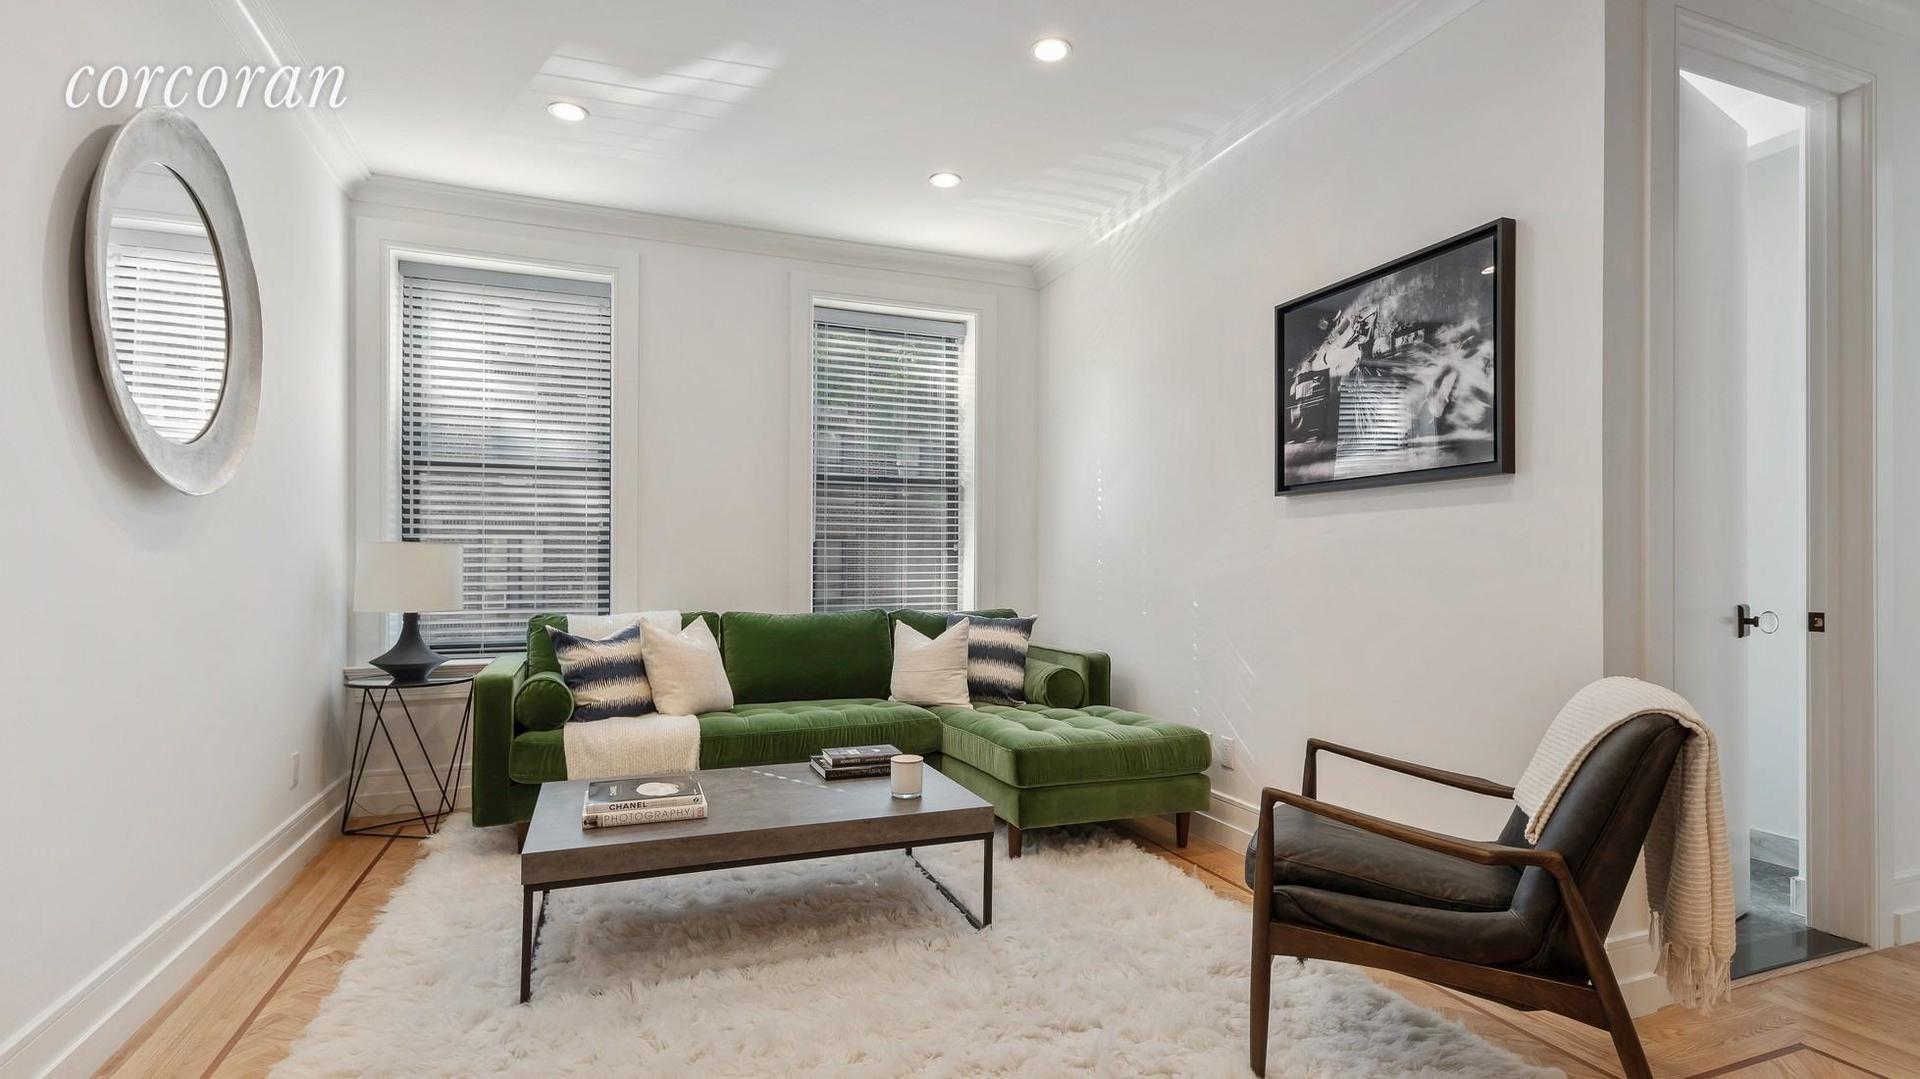 Apartment for sale at 24-39 38th Street, Apt B1B2